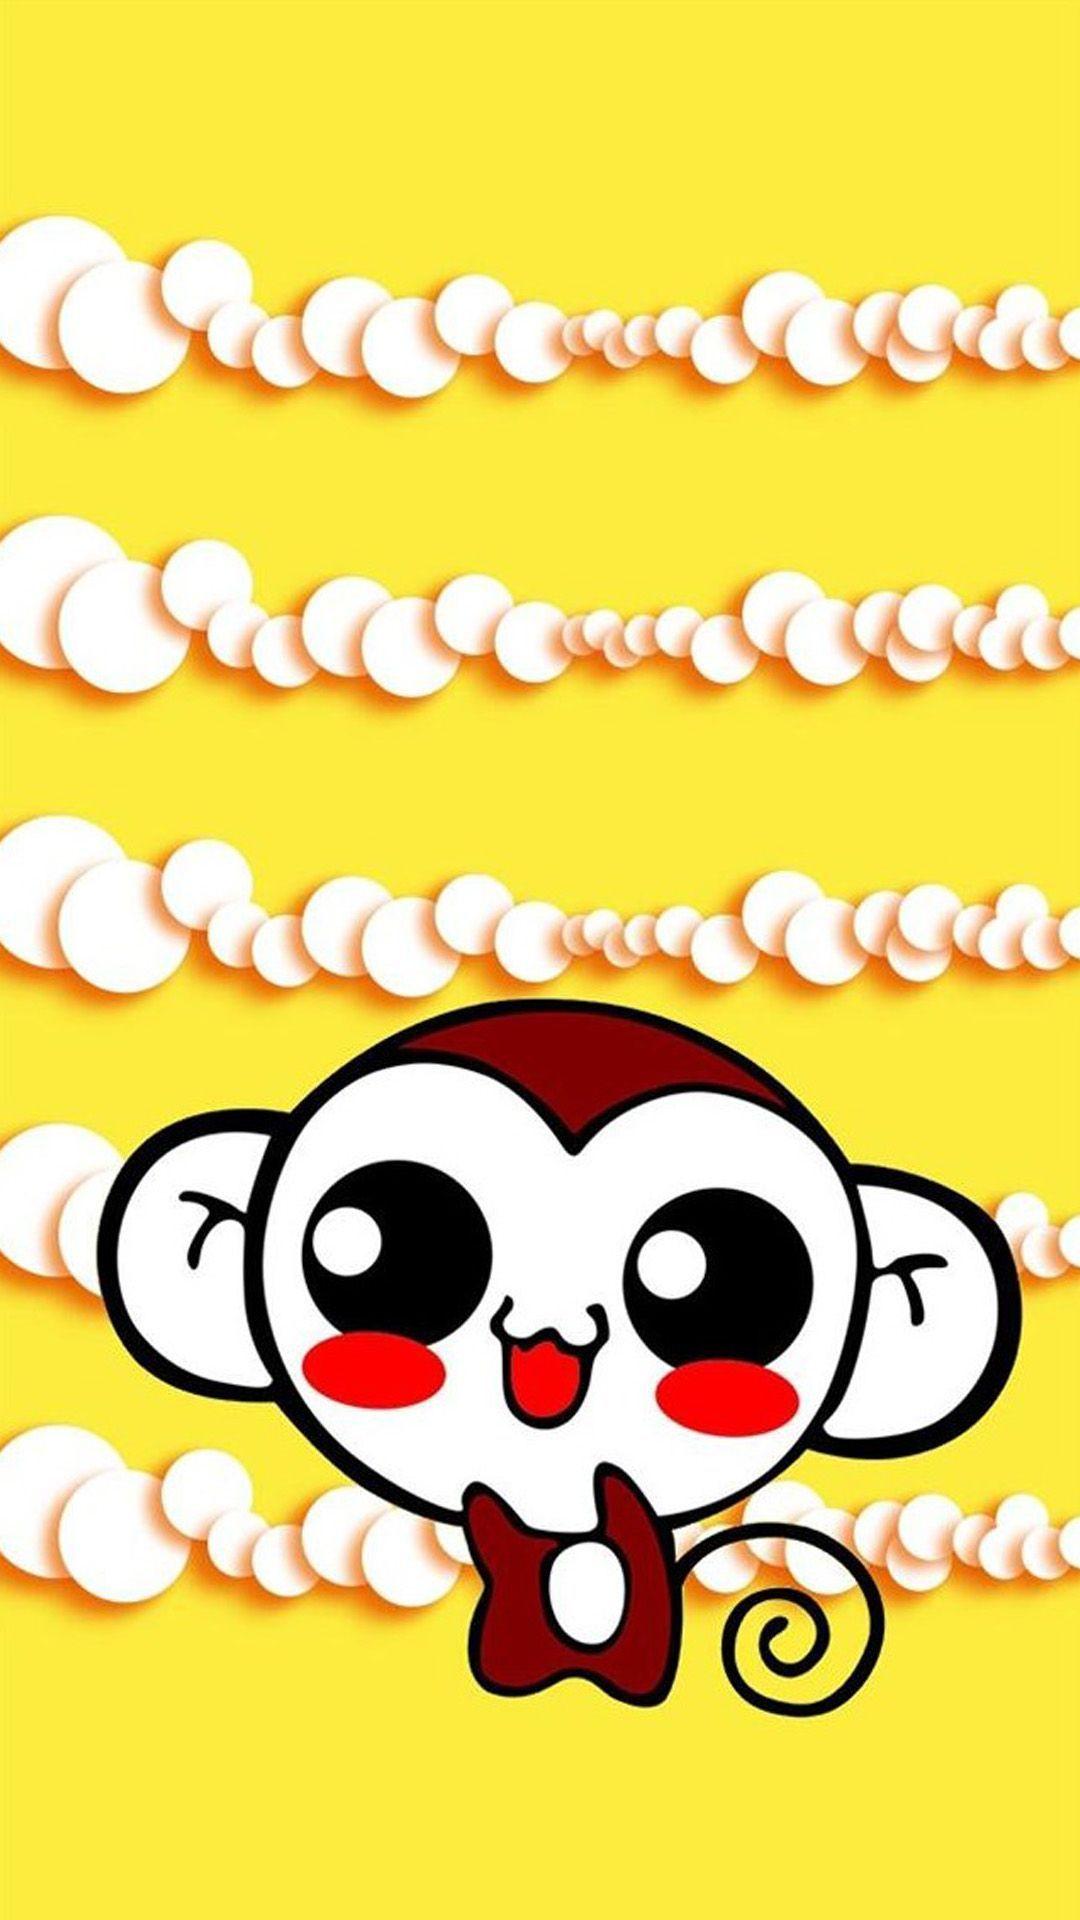 Savage Emoji Wallpapers Widescreen Hupages Download Iphone Wallpapers Cute Iphone 6 Wallpaper Wallpaper Iphone Cute Monkey Wallpaper